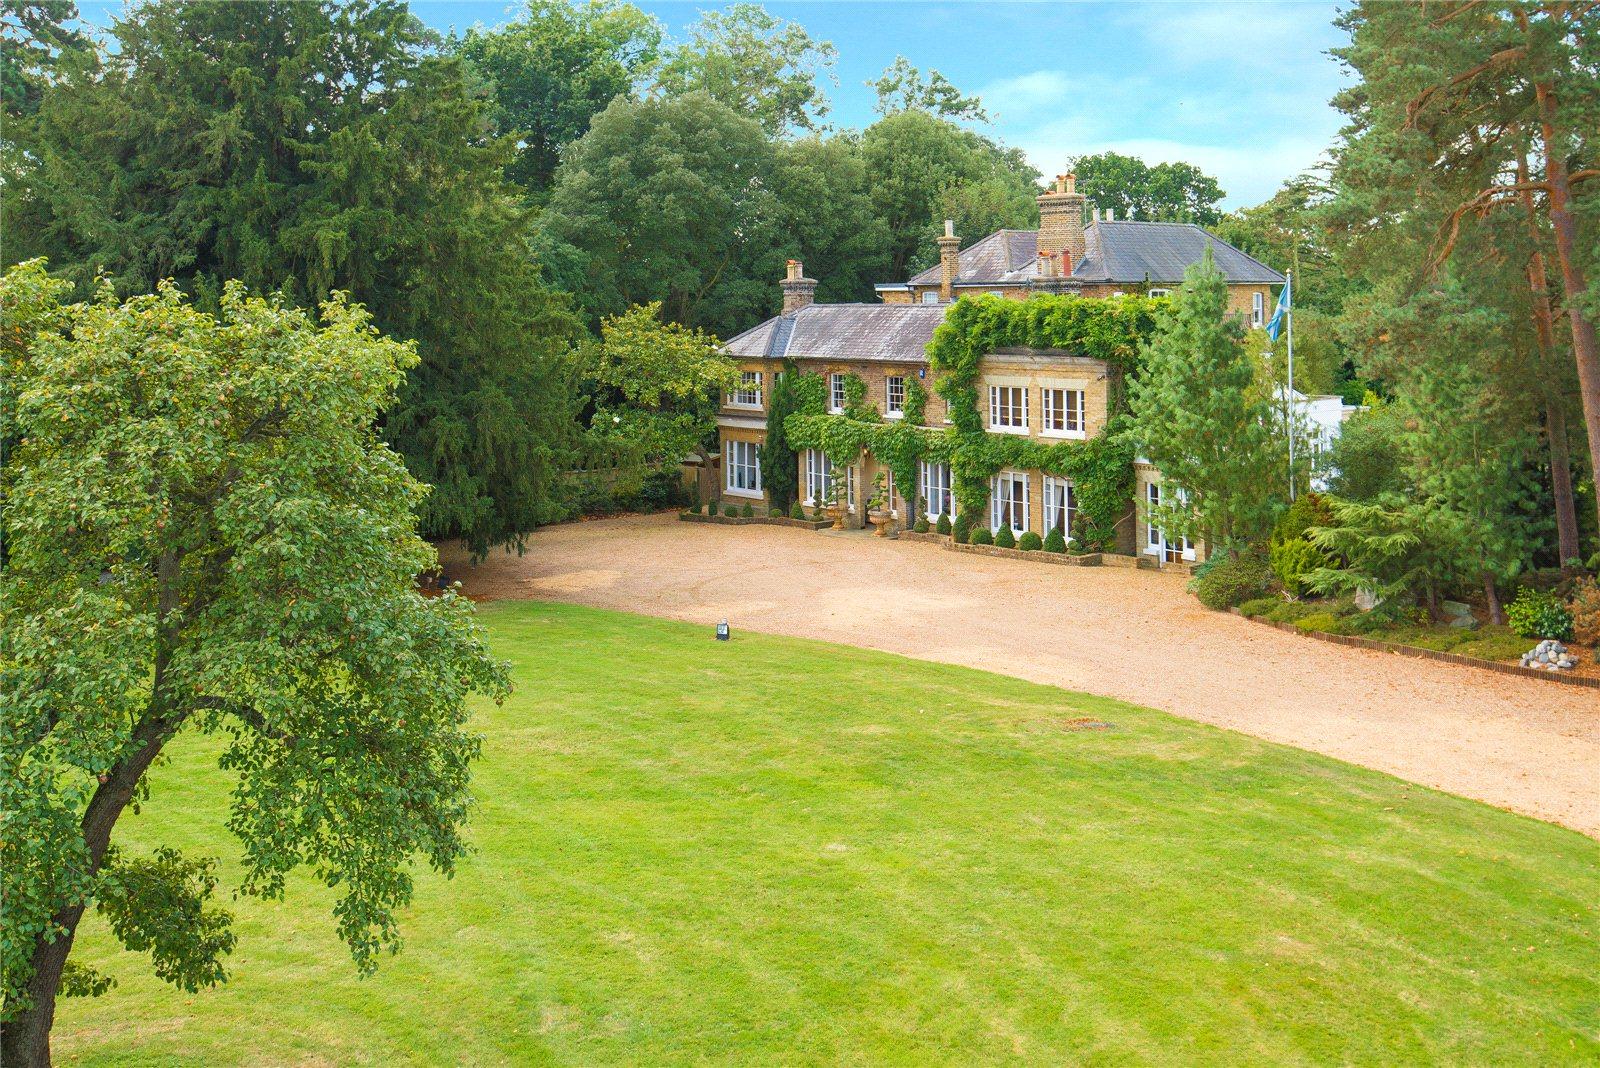 Maison unifamiliale pour l Vente à Church Lane, Broxbourne, Hertfordshire, EN10 Broxbourne, Angleterre